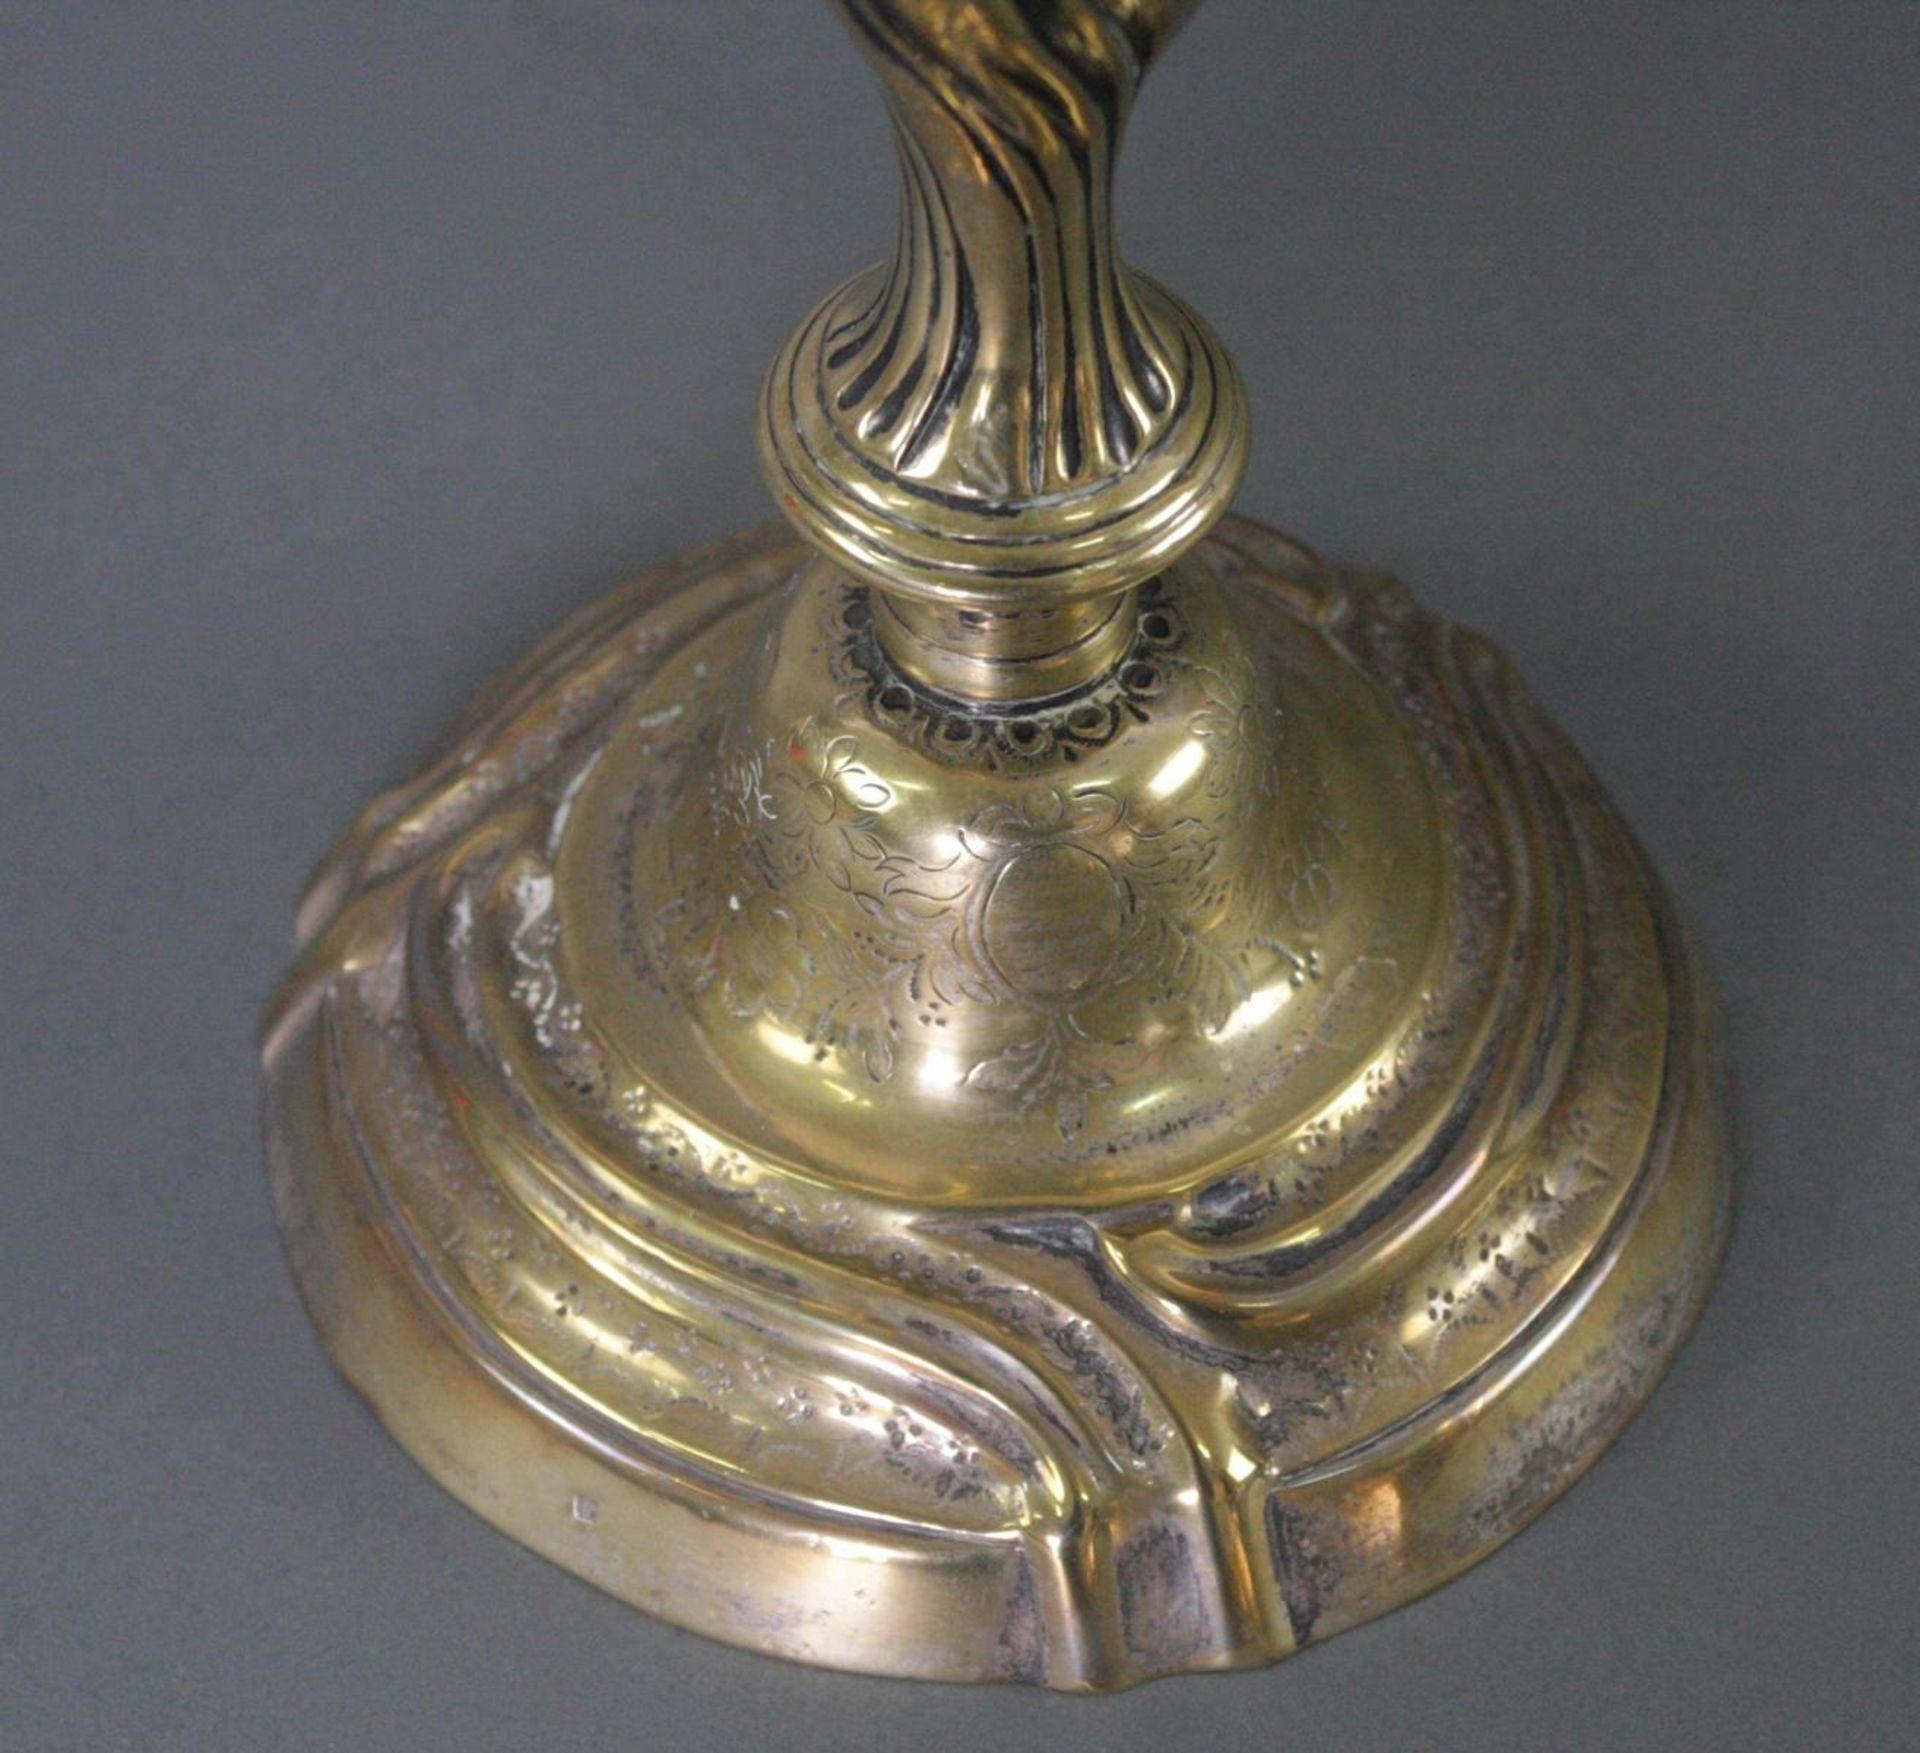 Kerzenhalter versilbert und vergoldet, 19. Jahrhundert - Bild 2 aus 5